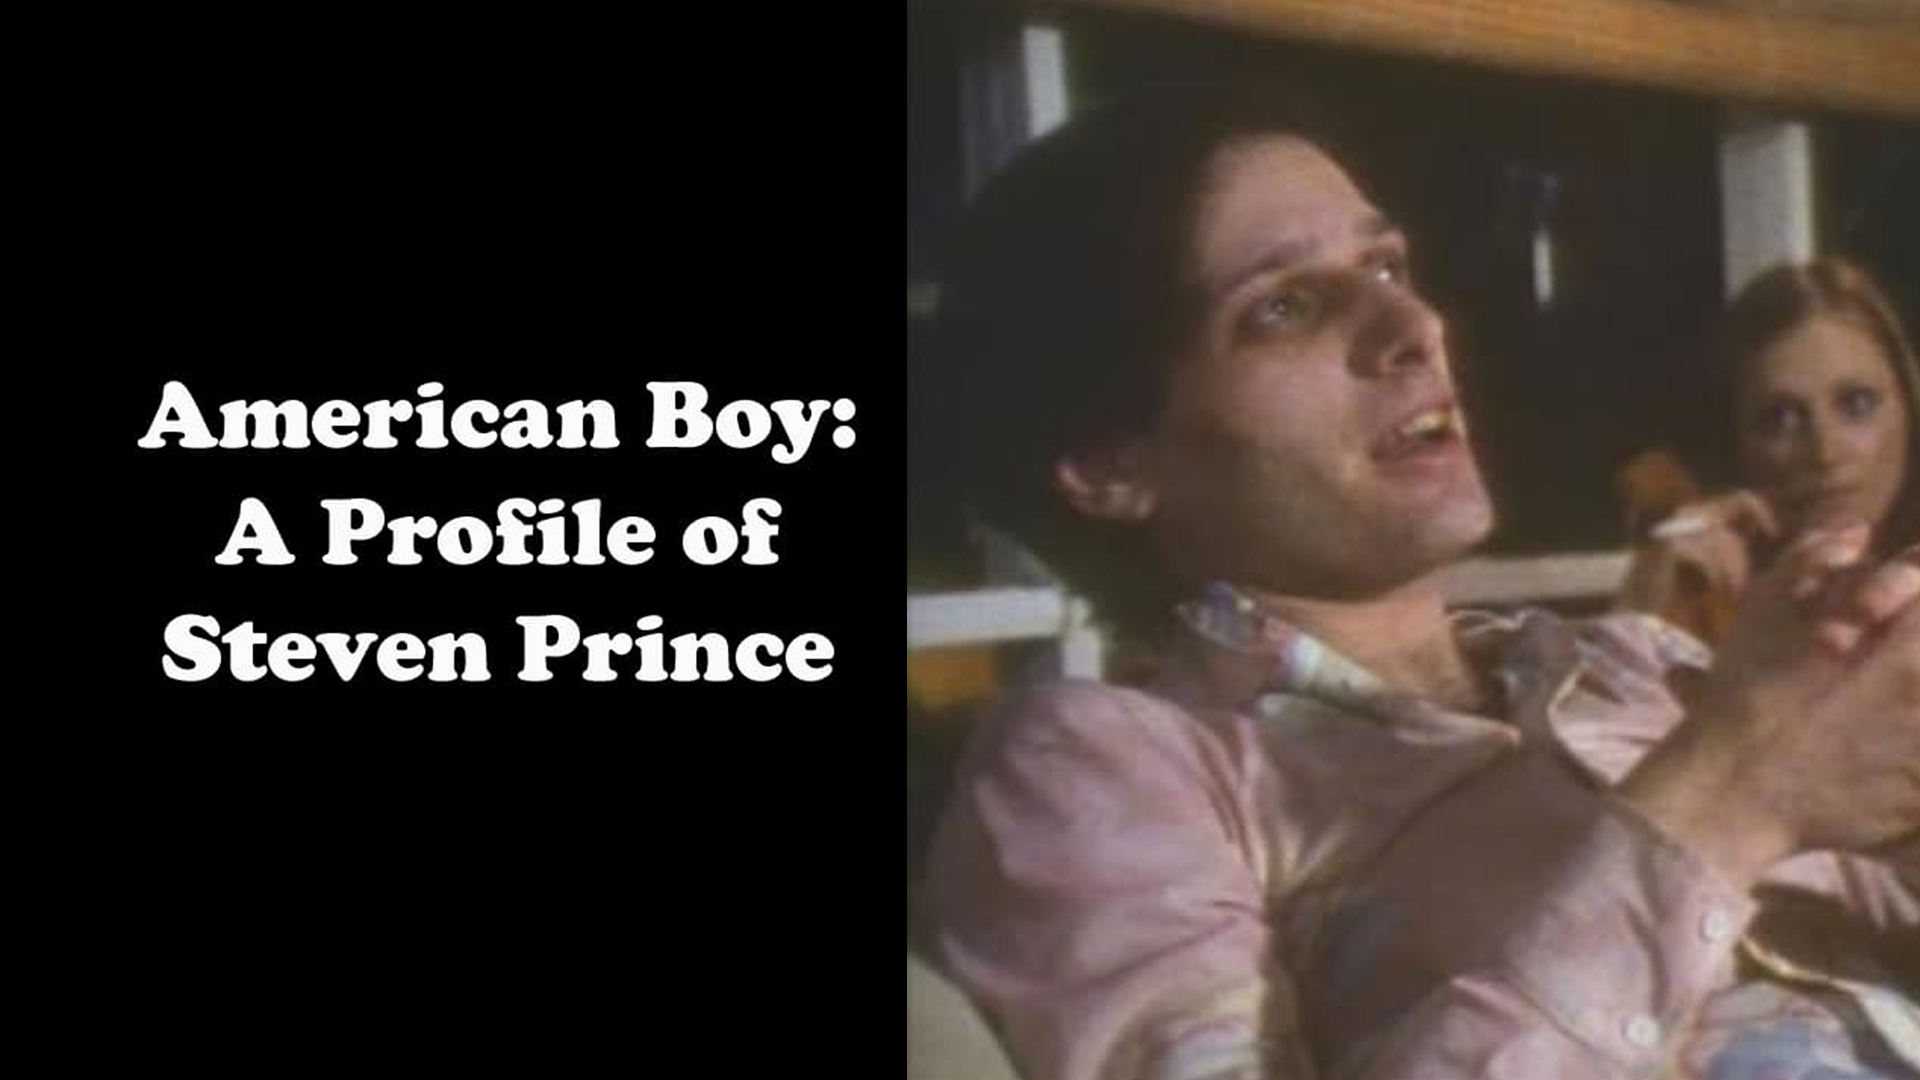 American Boy: A Profile Of Steven Prince